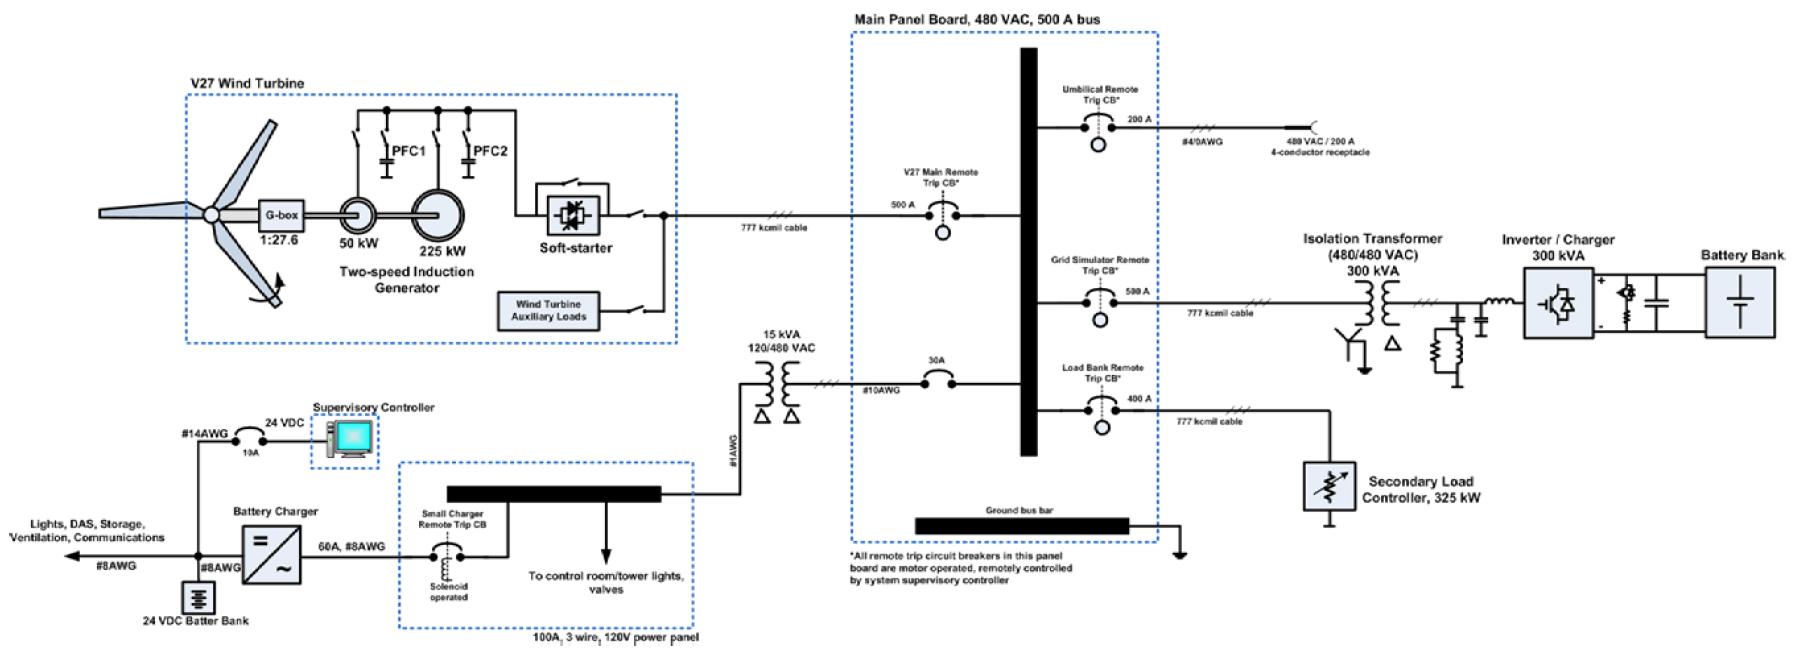 Battery/Inverter-Based Grid Simulator for V-27 225-kW Wind